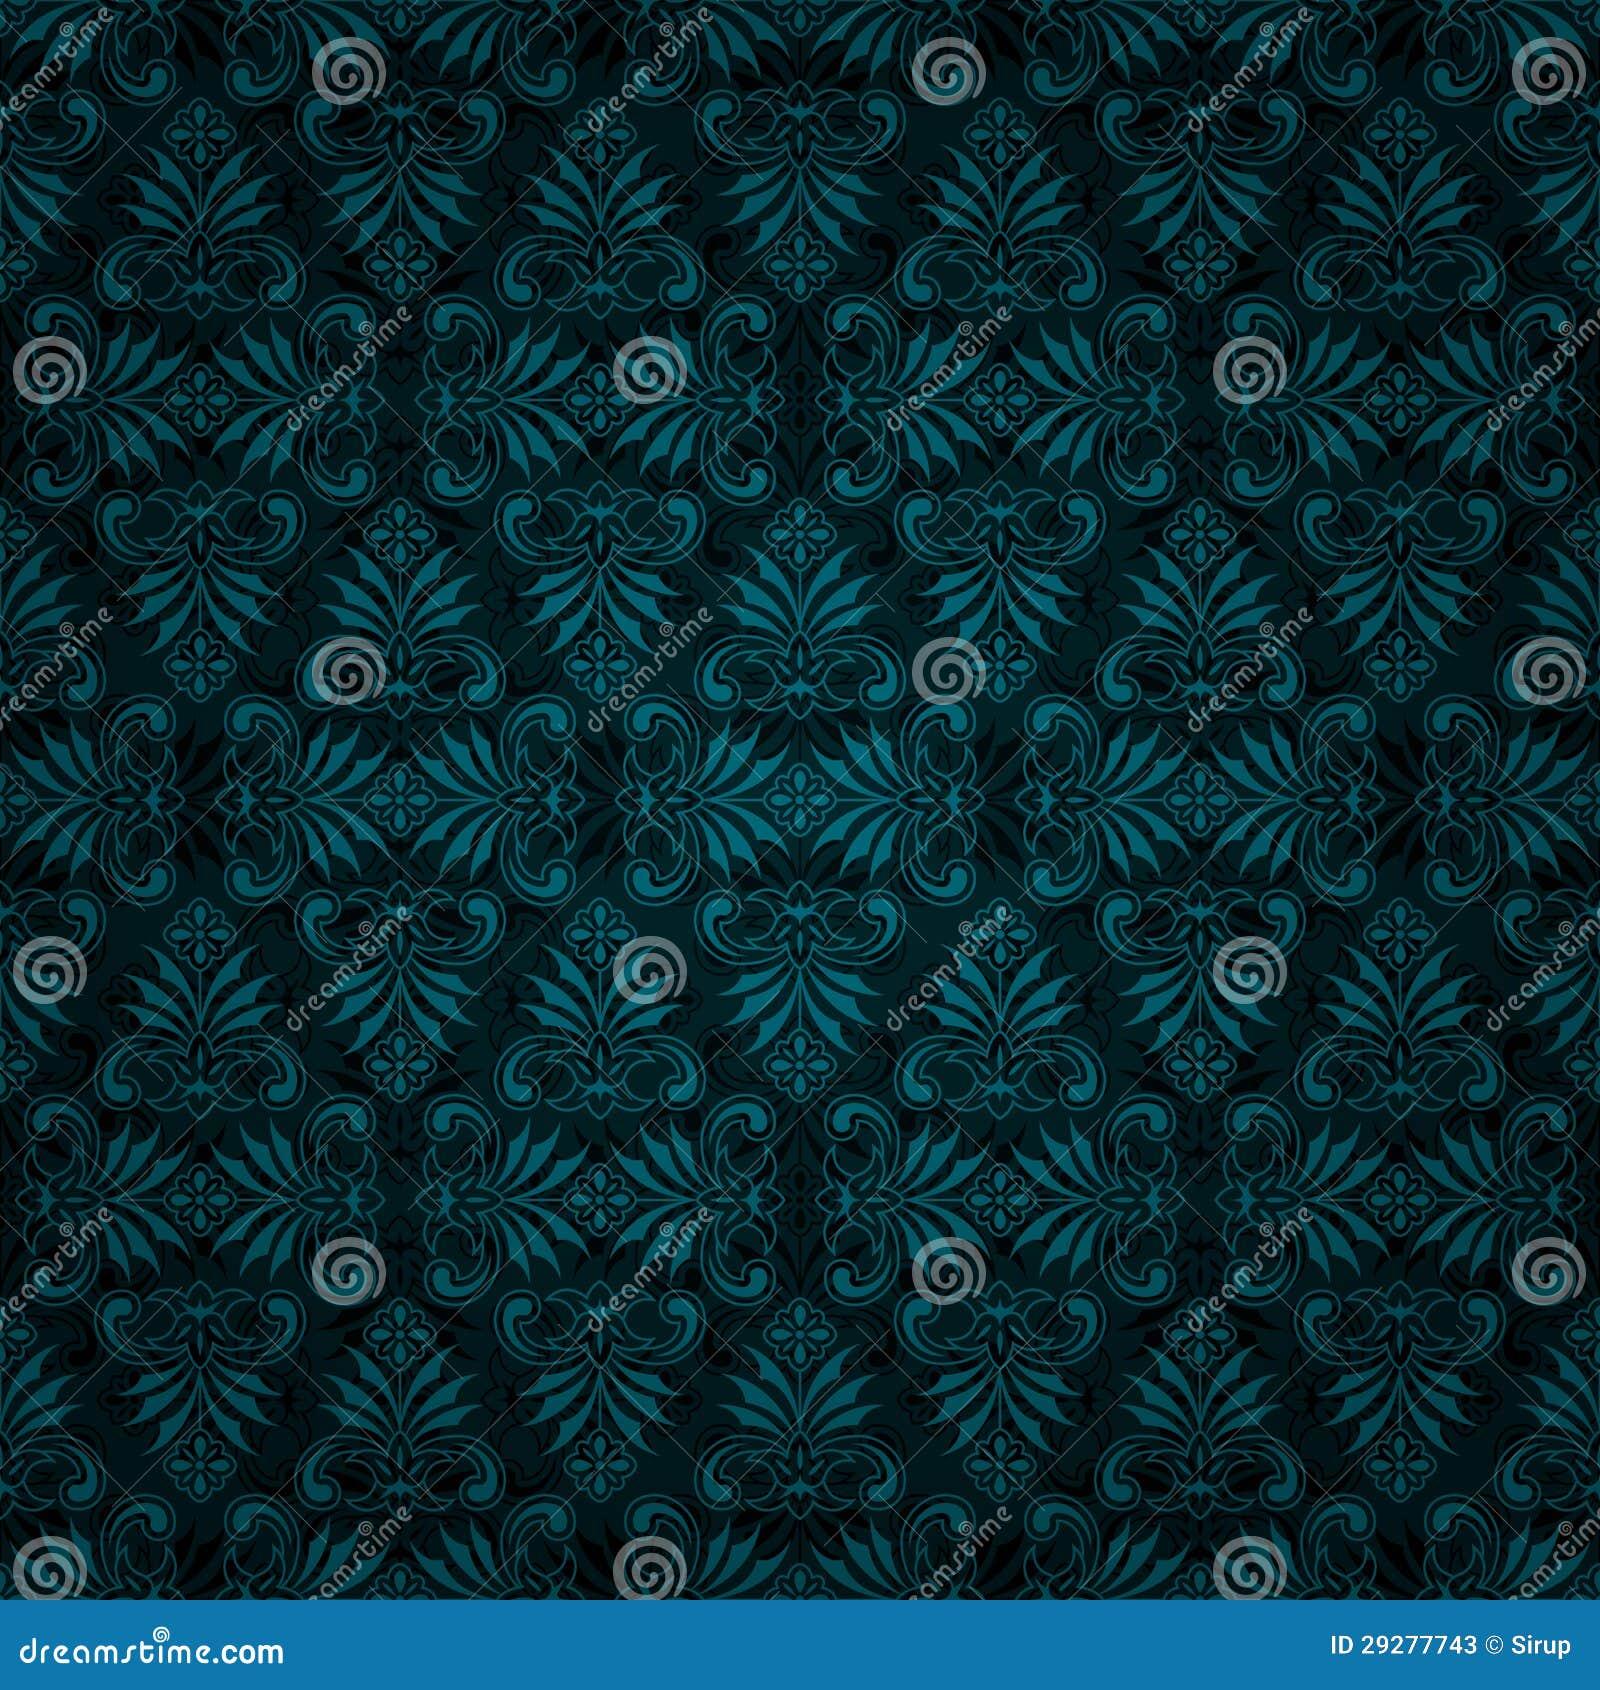 Seamless Dark Blue Tile Vintage Wallpaper Design Stock